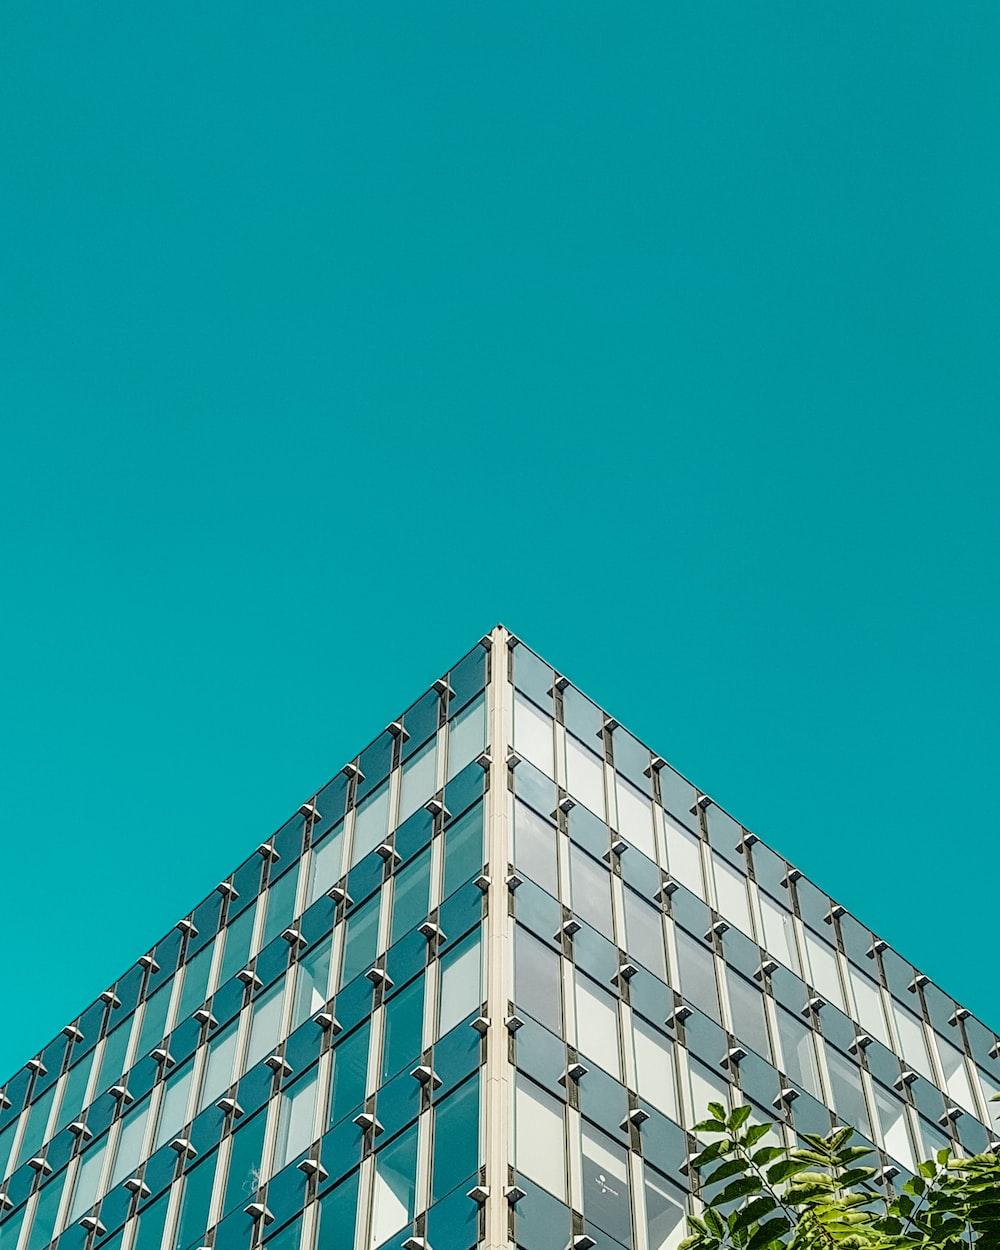 gray concrete building under teal sky